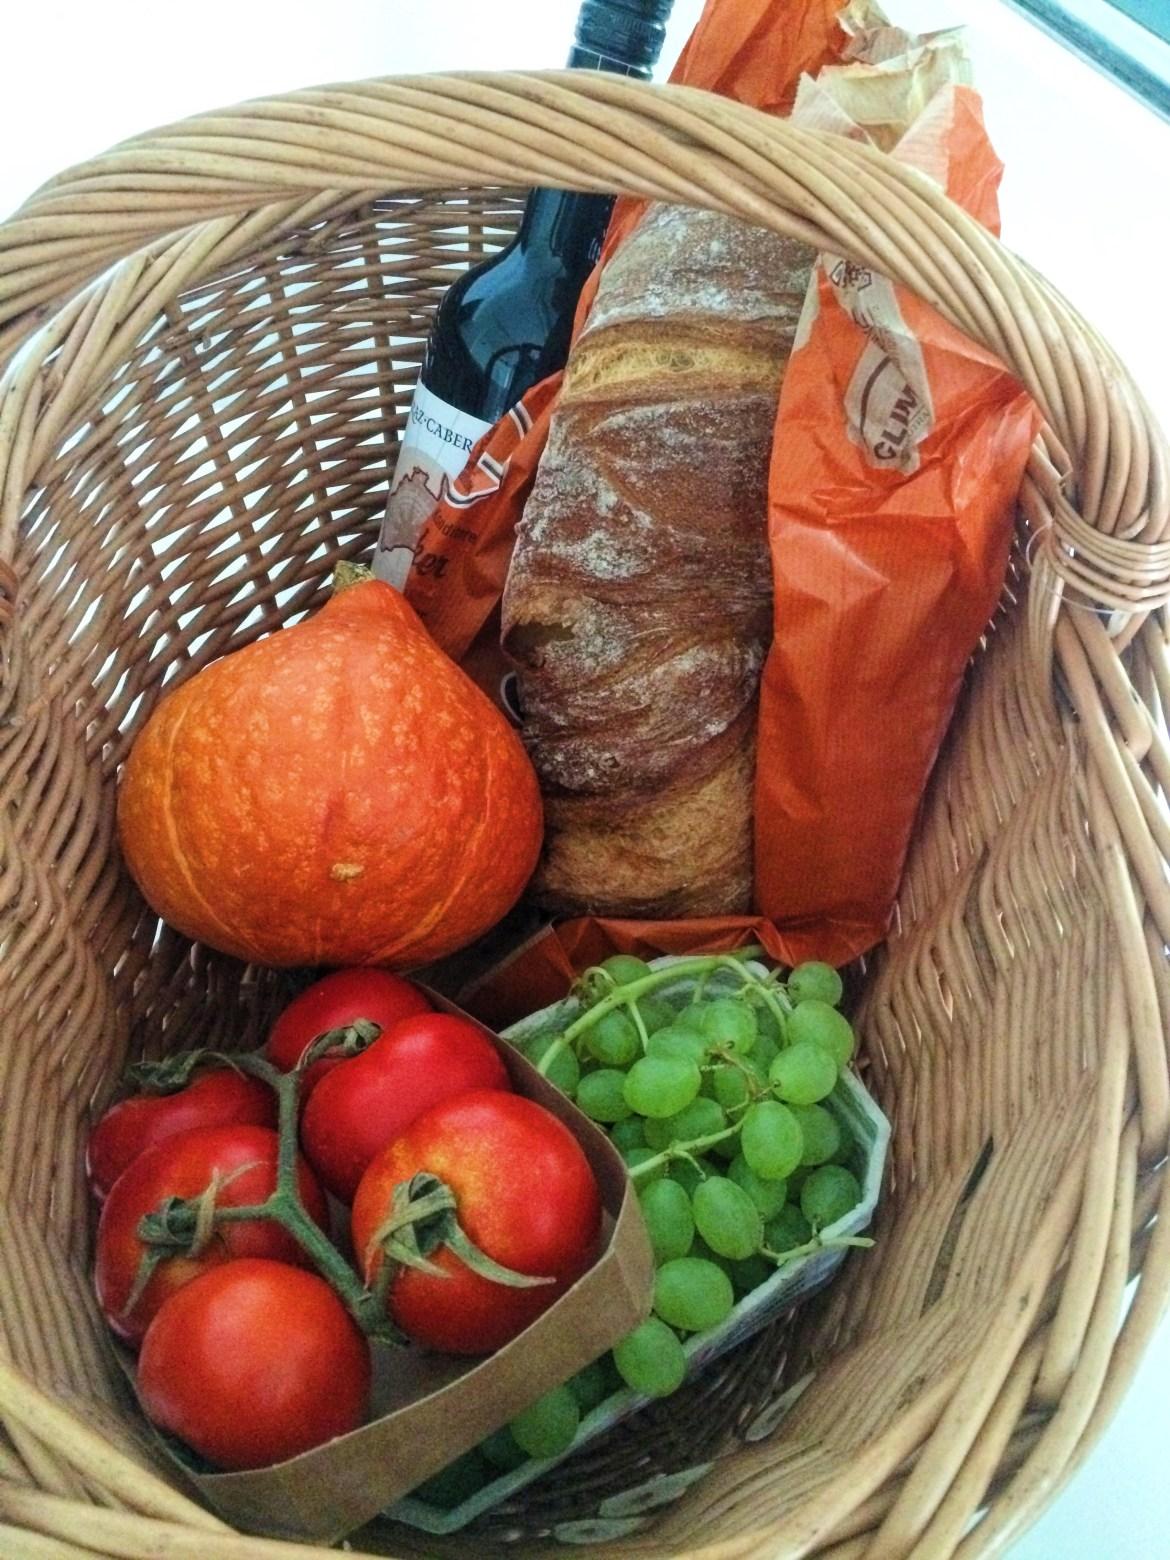 shopping basket, Snapshots of Tubingen, Germany, Deutschland